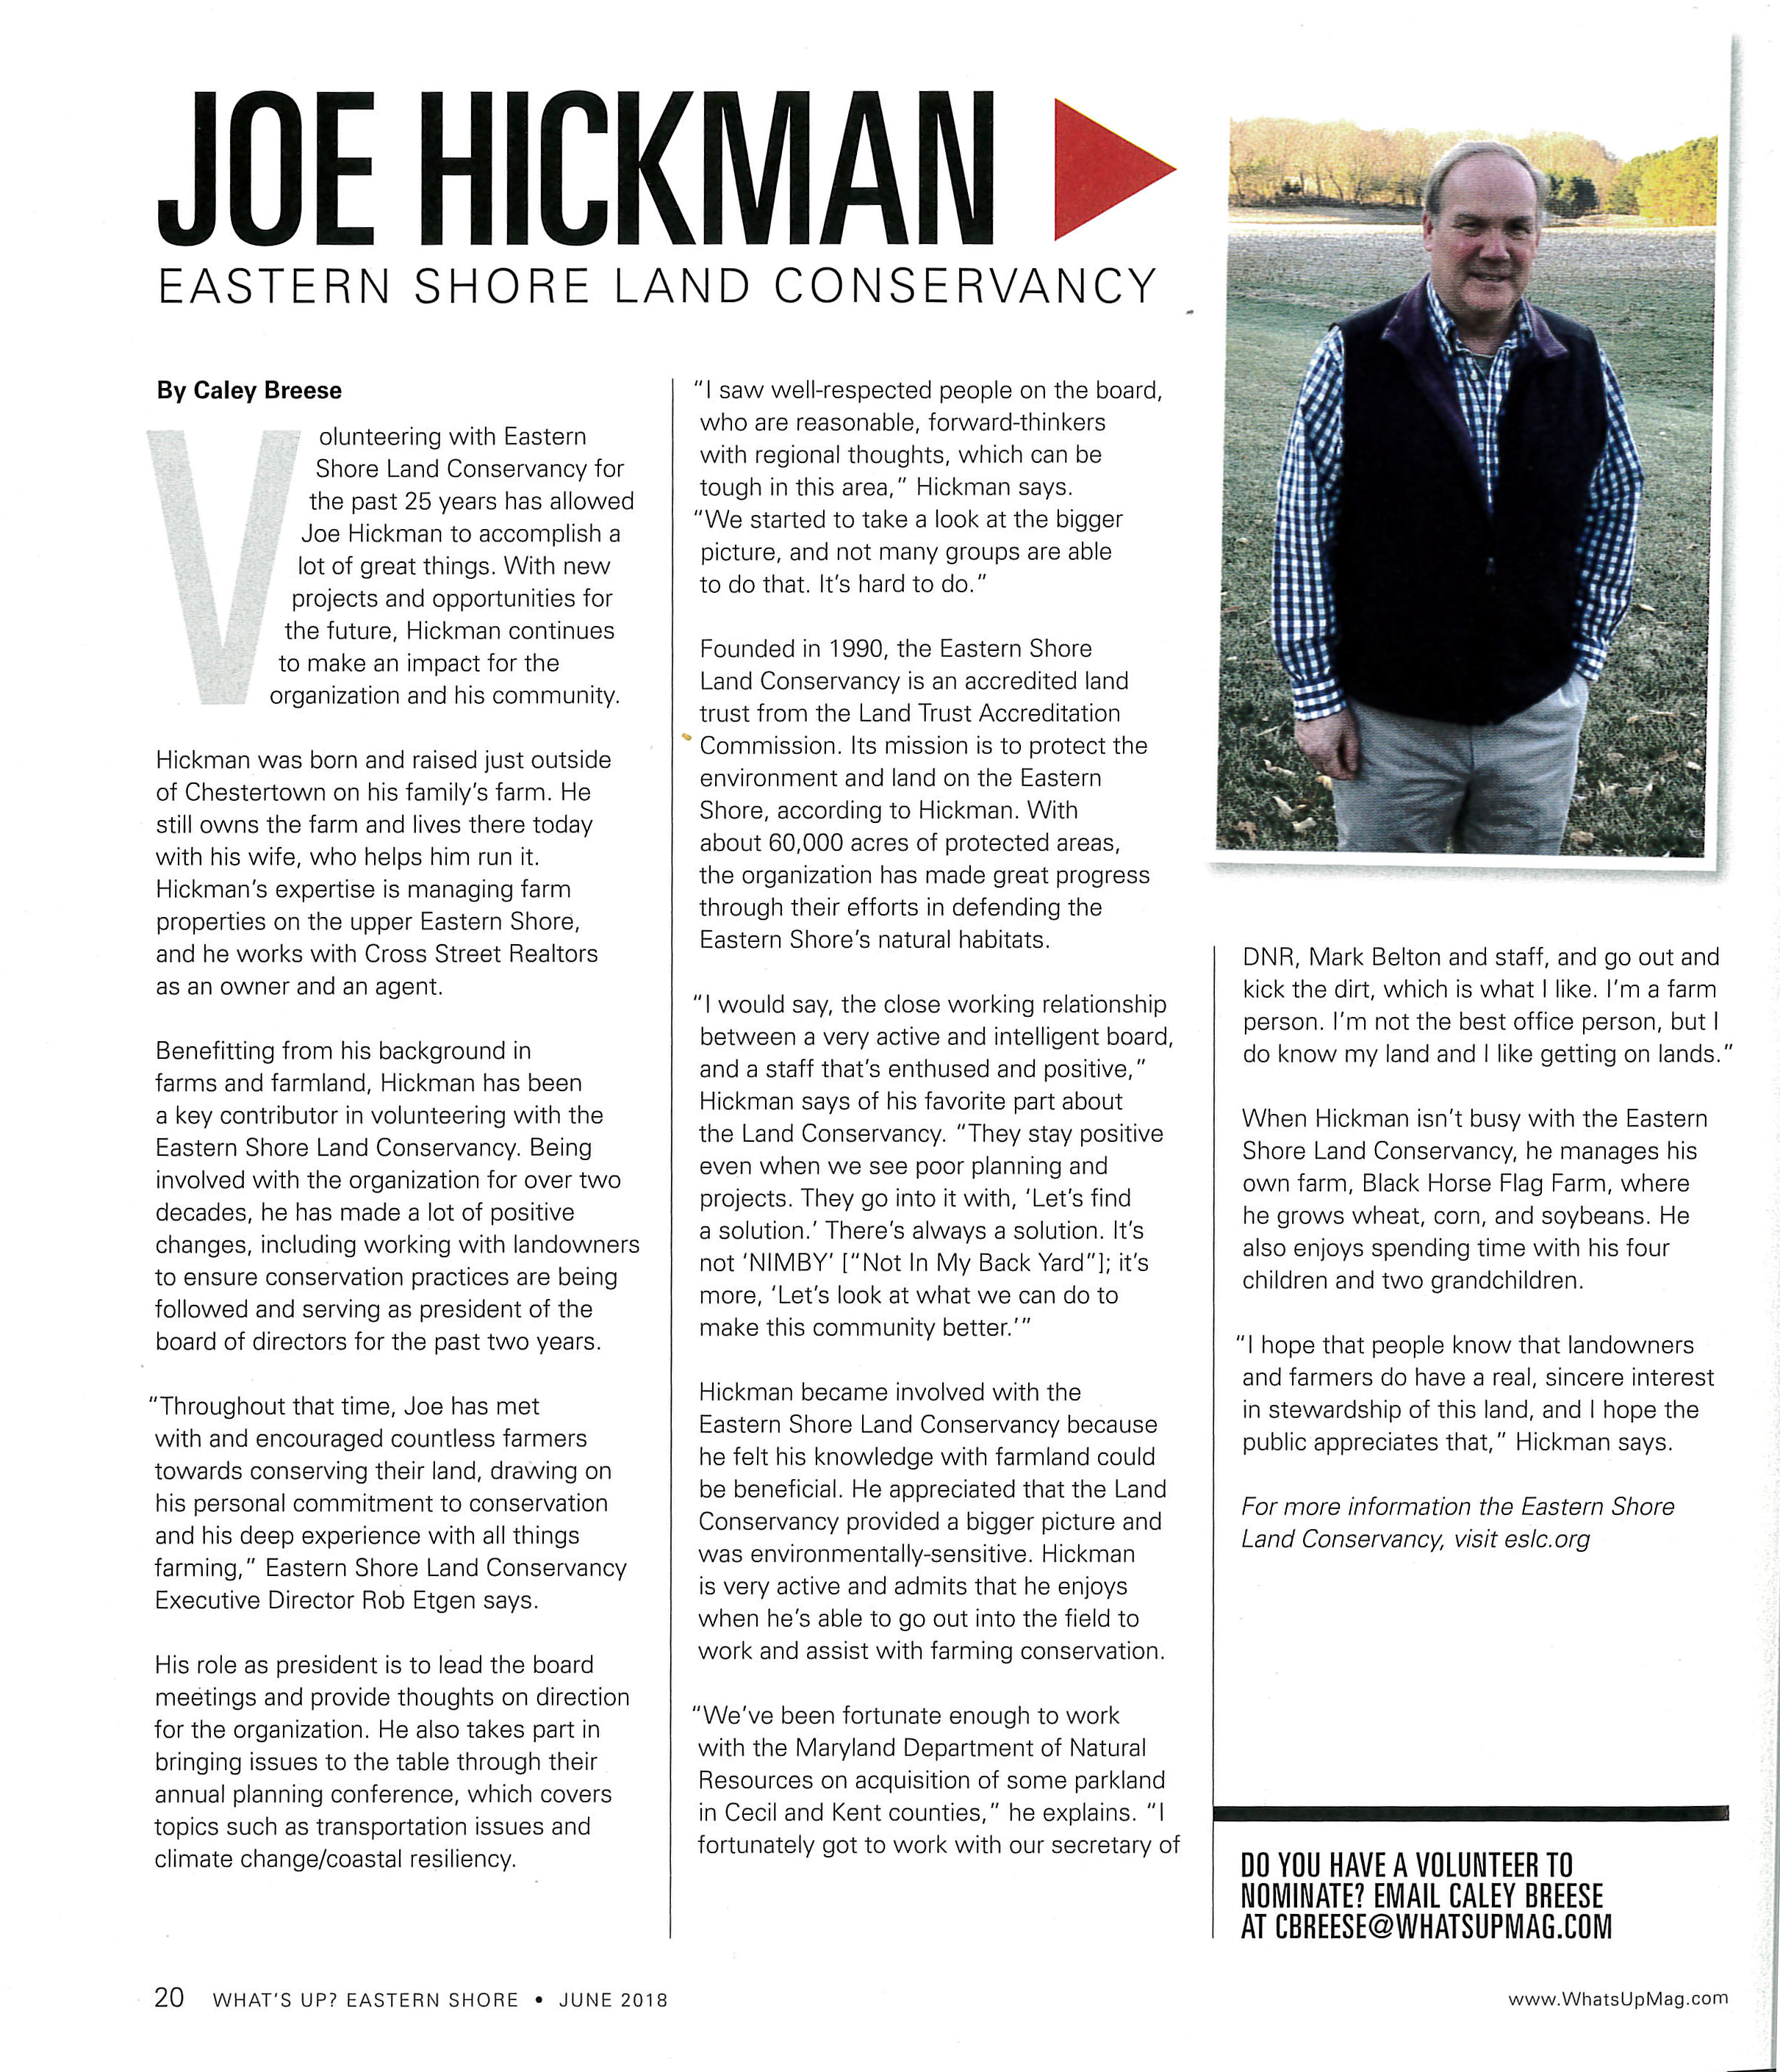 Joe Hickman